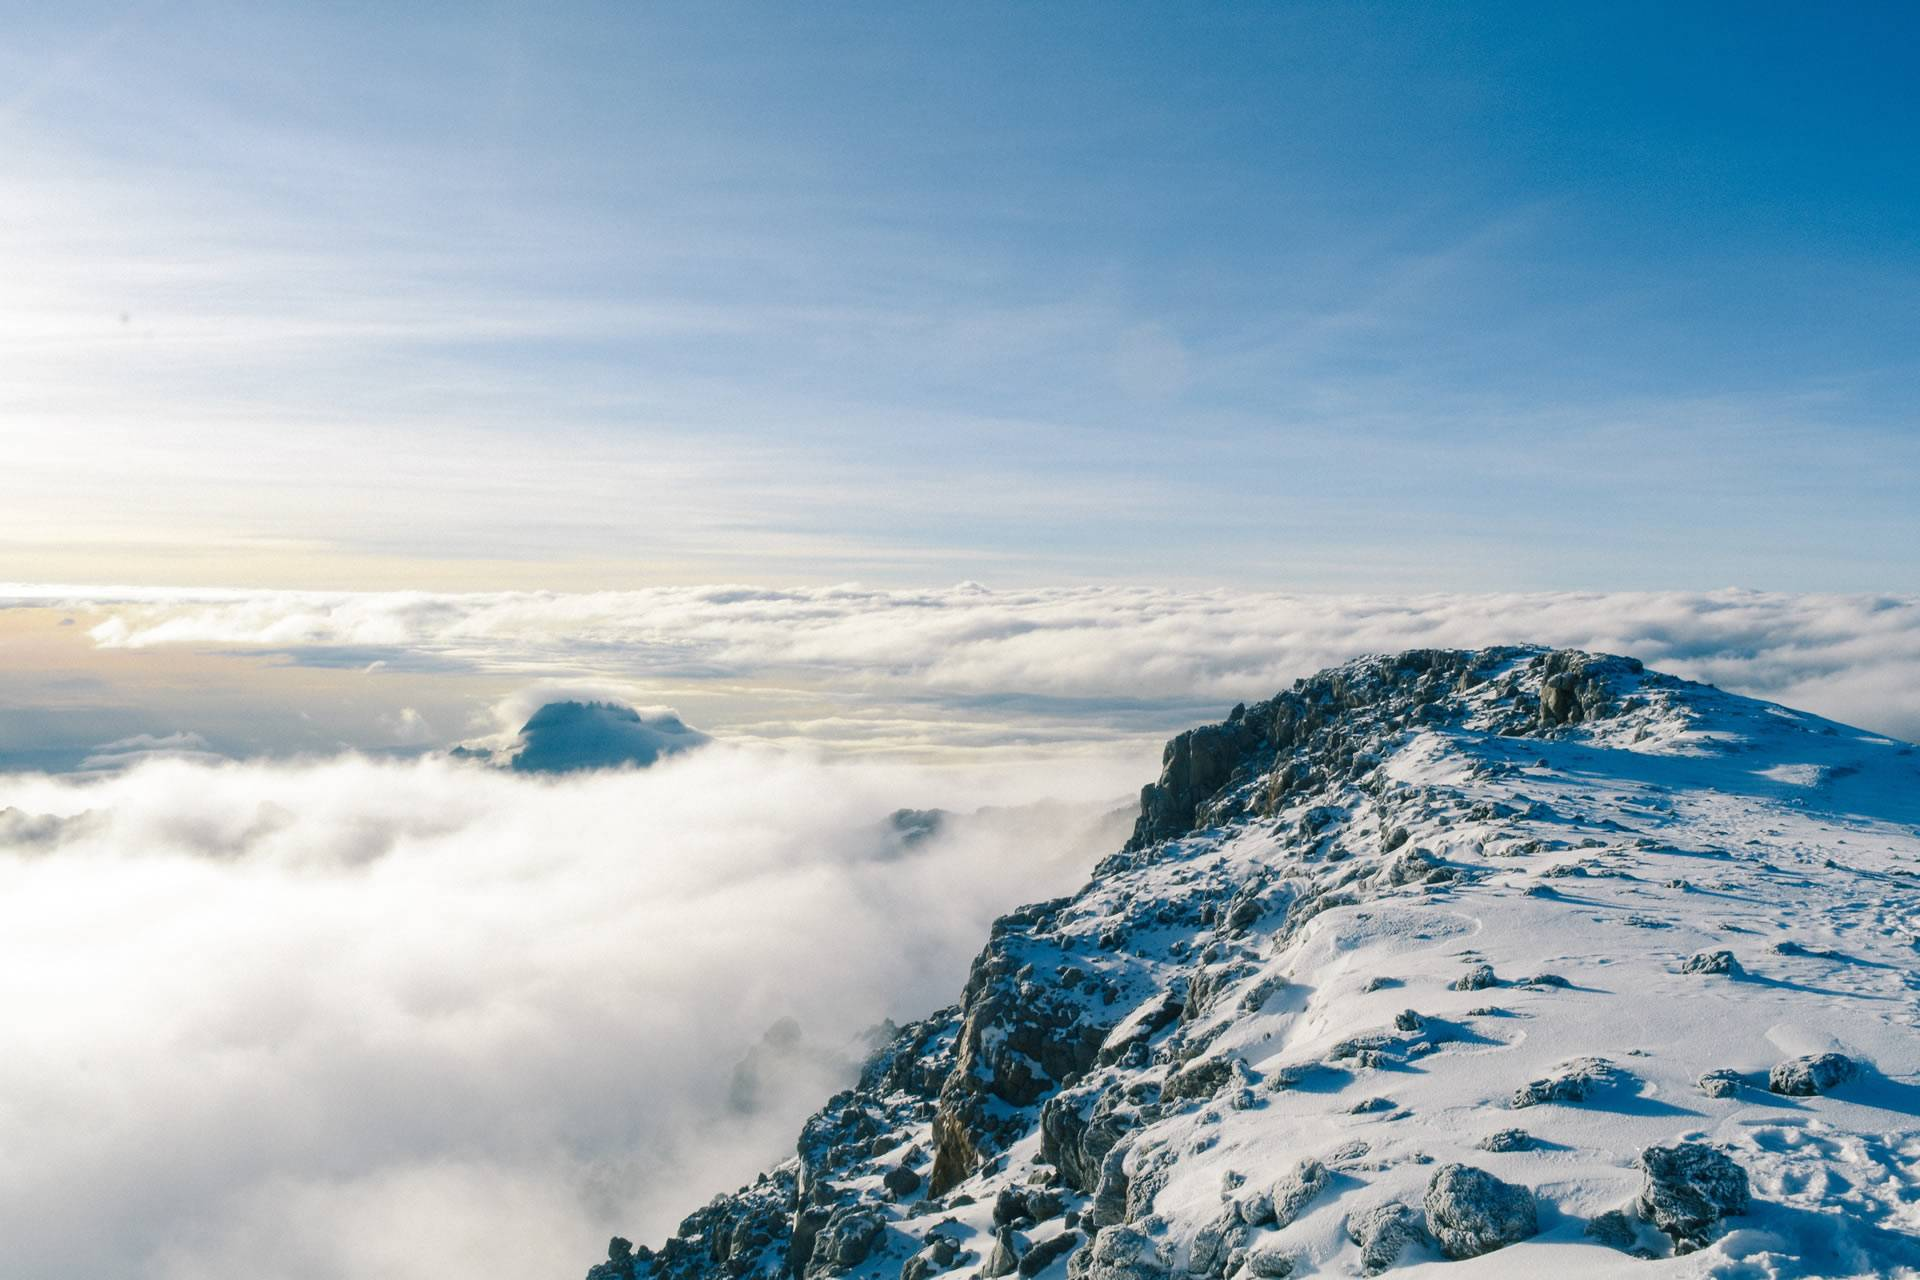 Climb Mount Kilimanjaro with the Best Tour Operator in Tanzania